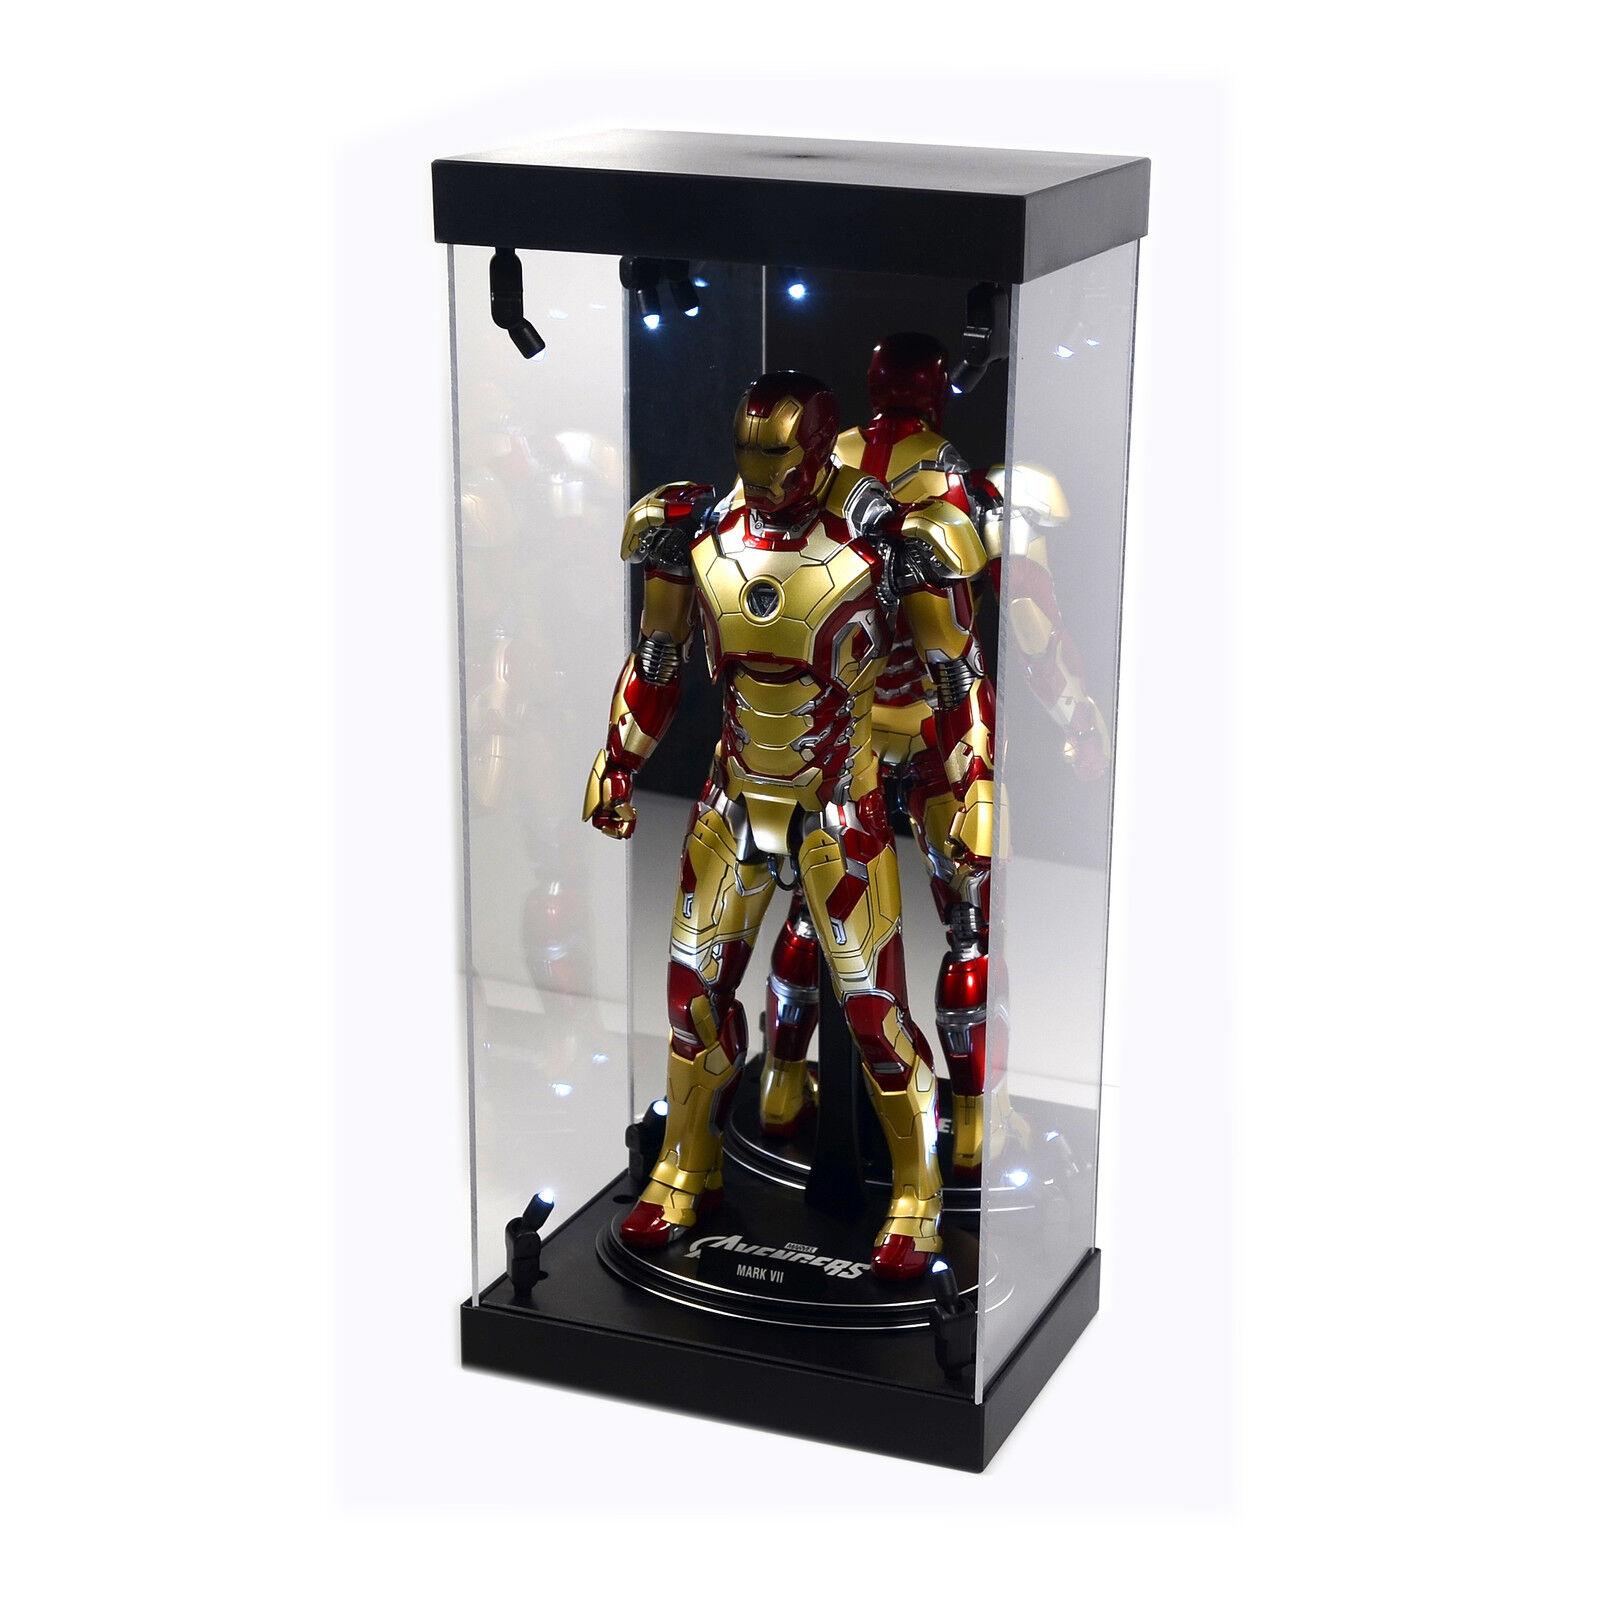 Acrylic Display Case LED Light Box for 12  1 6 Scale Pepper Potts Mark IX Figure